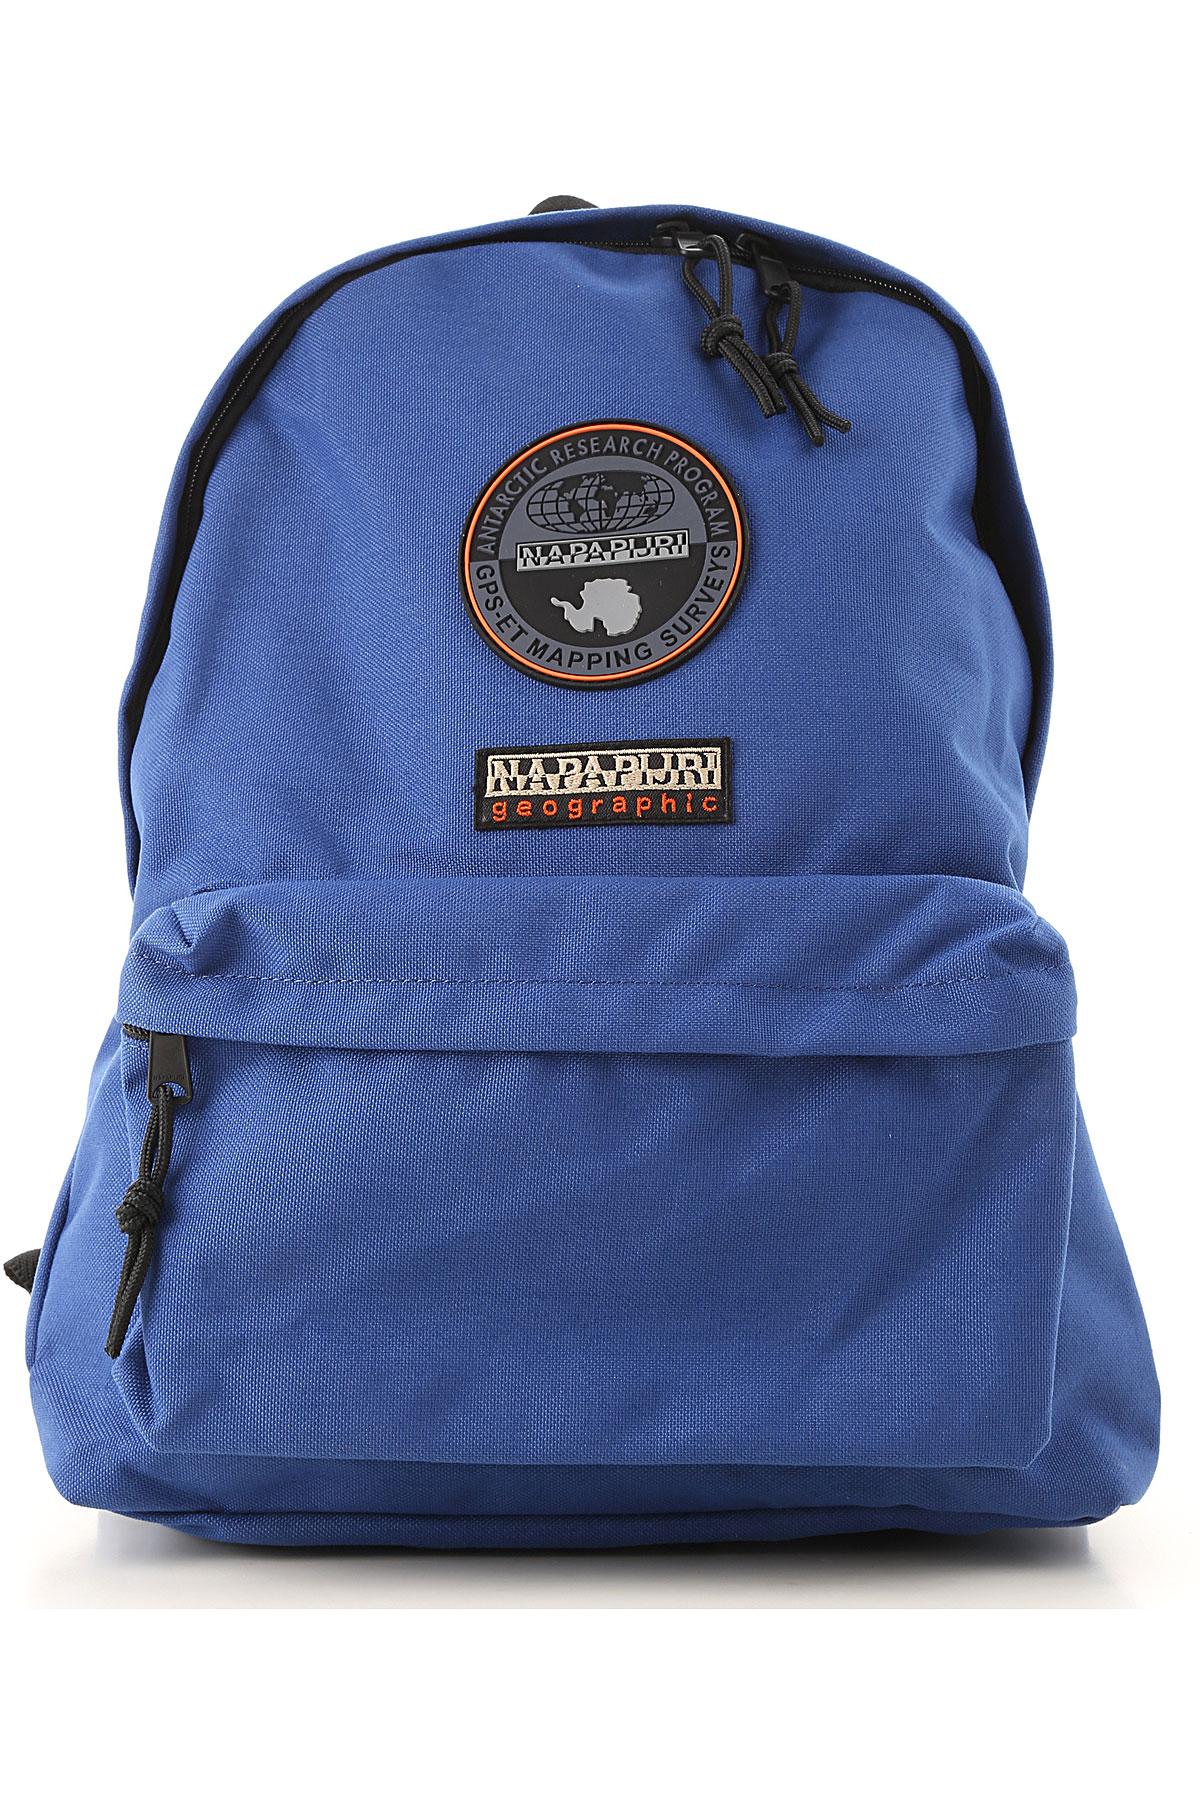 Image of Napapijri Backpack for Women, Bright Royal Blue, Fabric, 2017